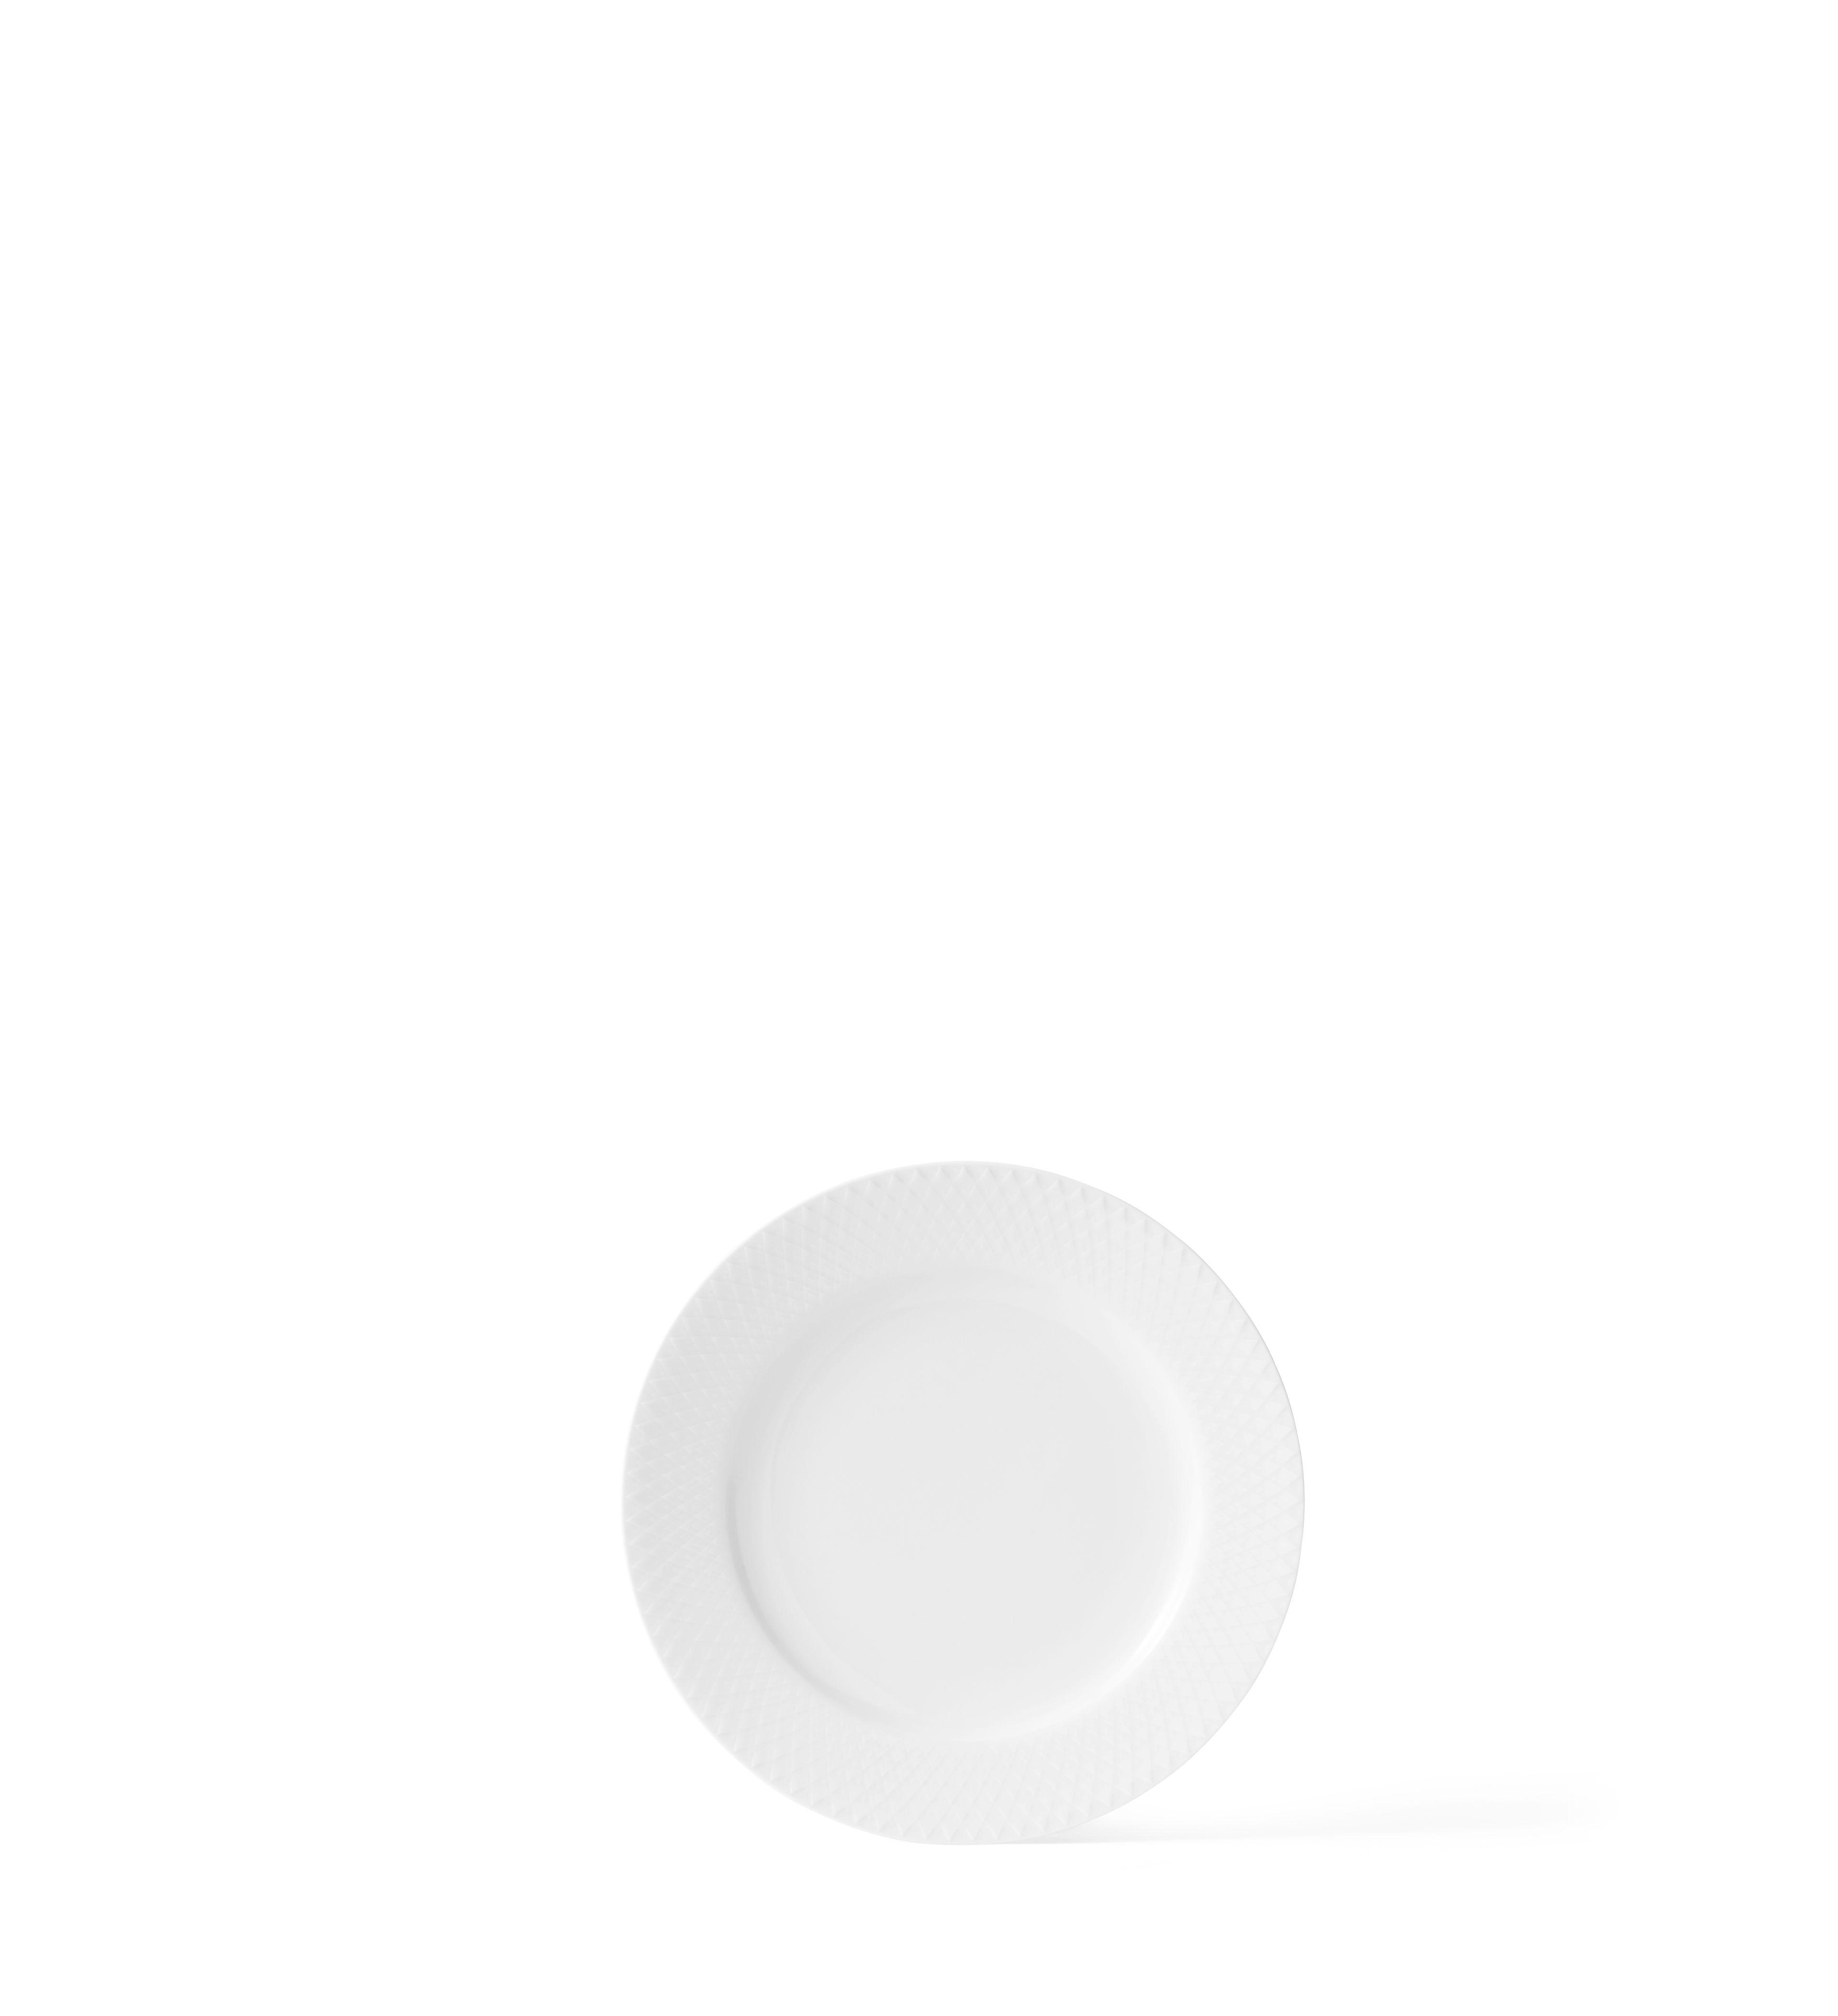 Lyngby Porcelæn Rhombe frokosttallerken, Ø21 cm